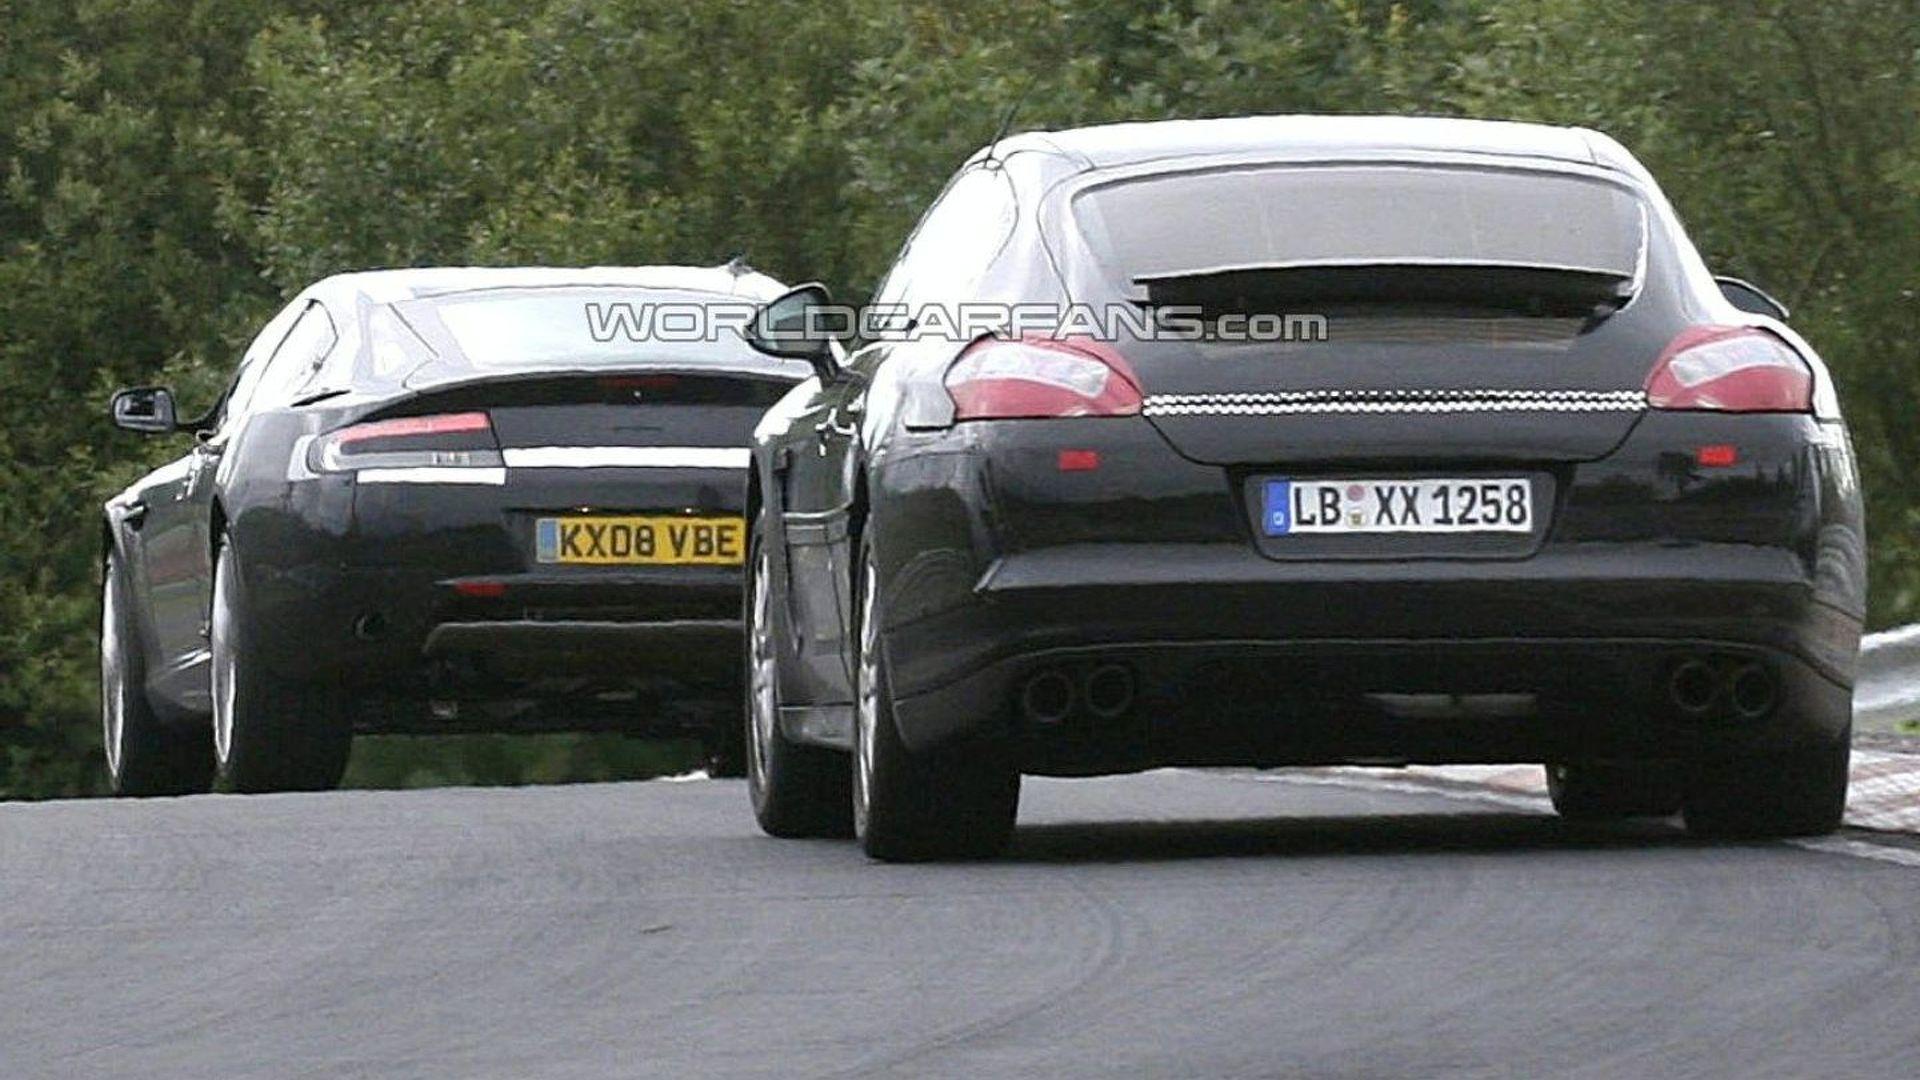 Aston Martin Rapide Vs Porsche Panamera 46316